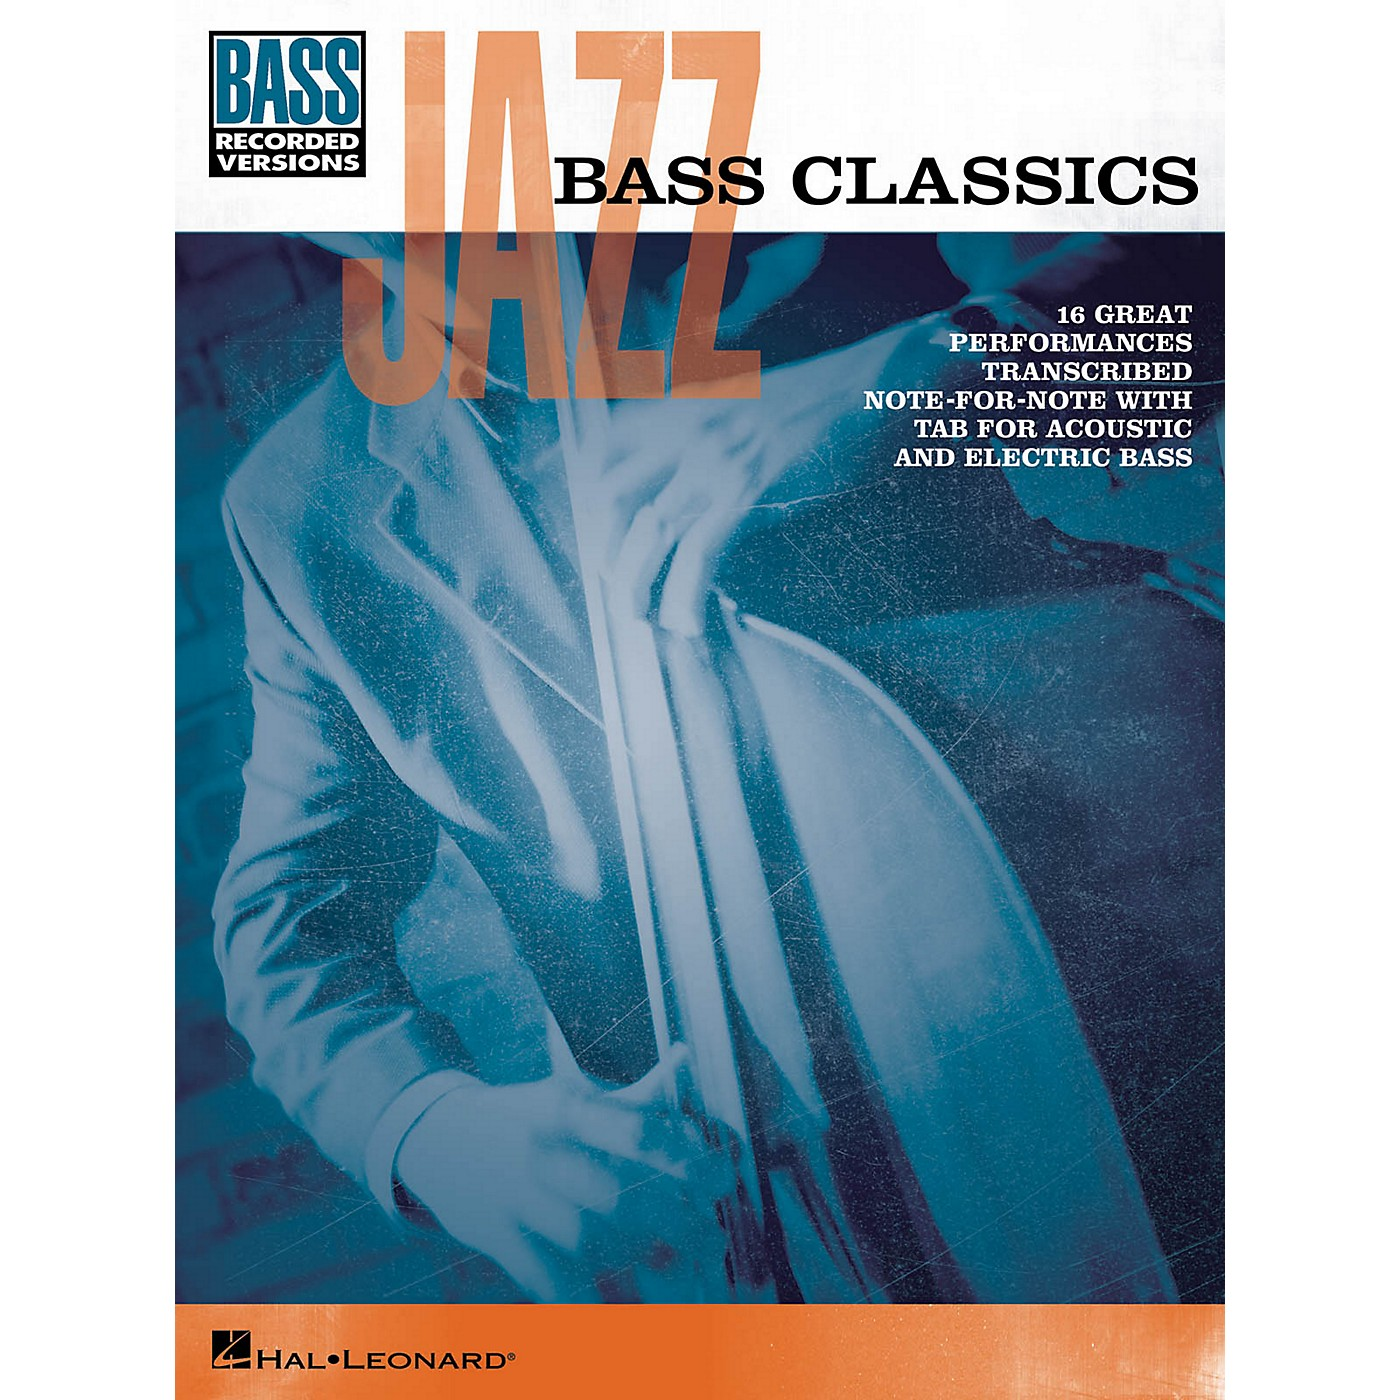 Hal Leonard Jazz Bass Classics Bass Tab Songbook thumbnail